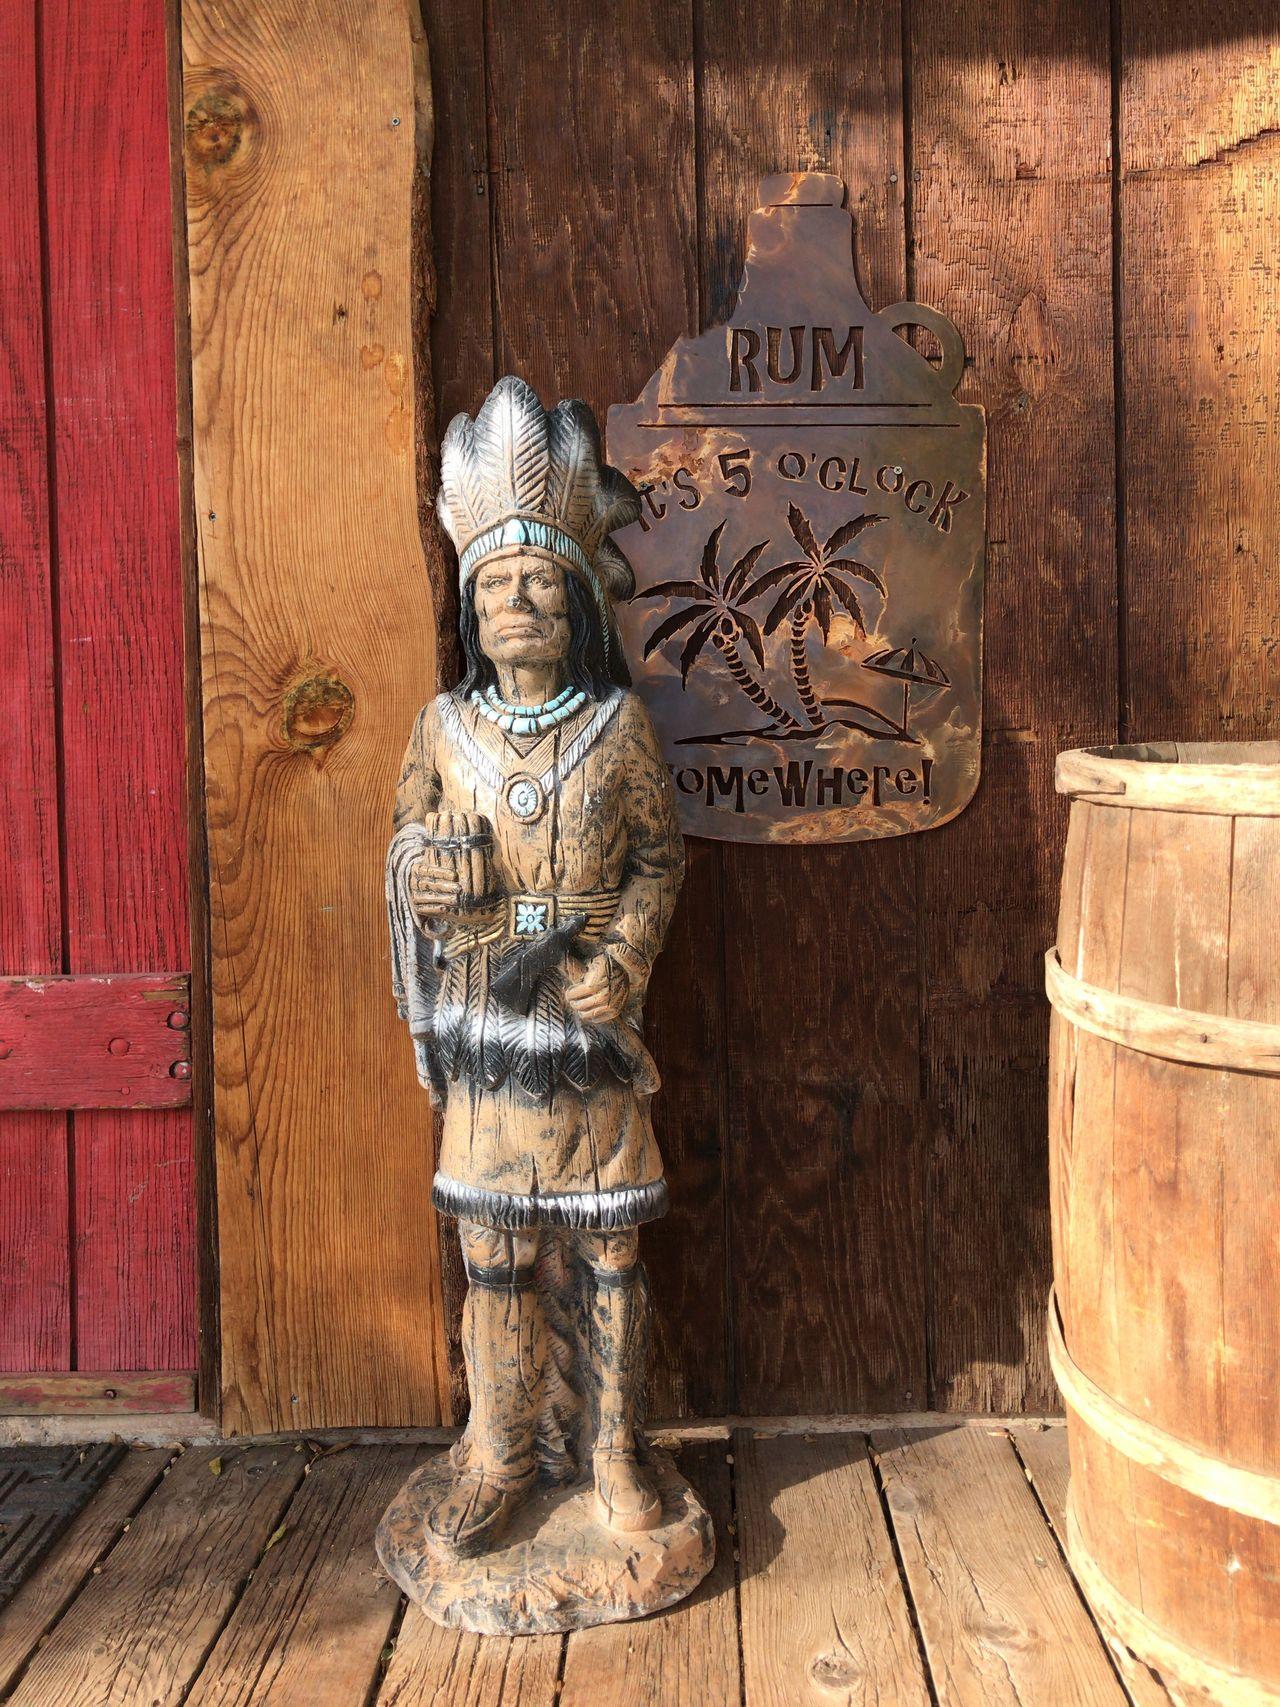 Wood Wooden Wood Art Wood Carving Shootermagazine Malephotographerofthemonth Shootermag_usa Streamzoofamily Sculpture Statue Headdress Native American Indian Youmobile Headwear